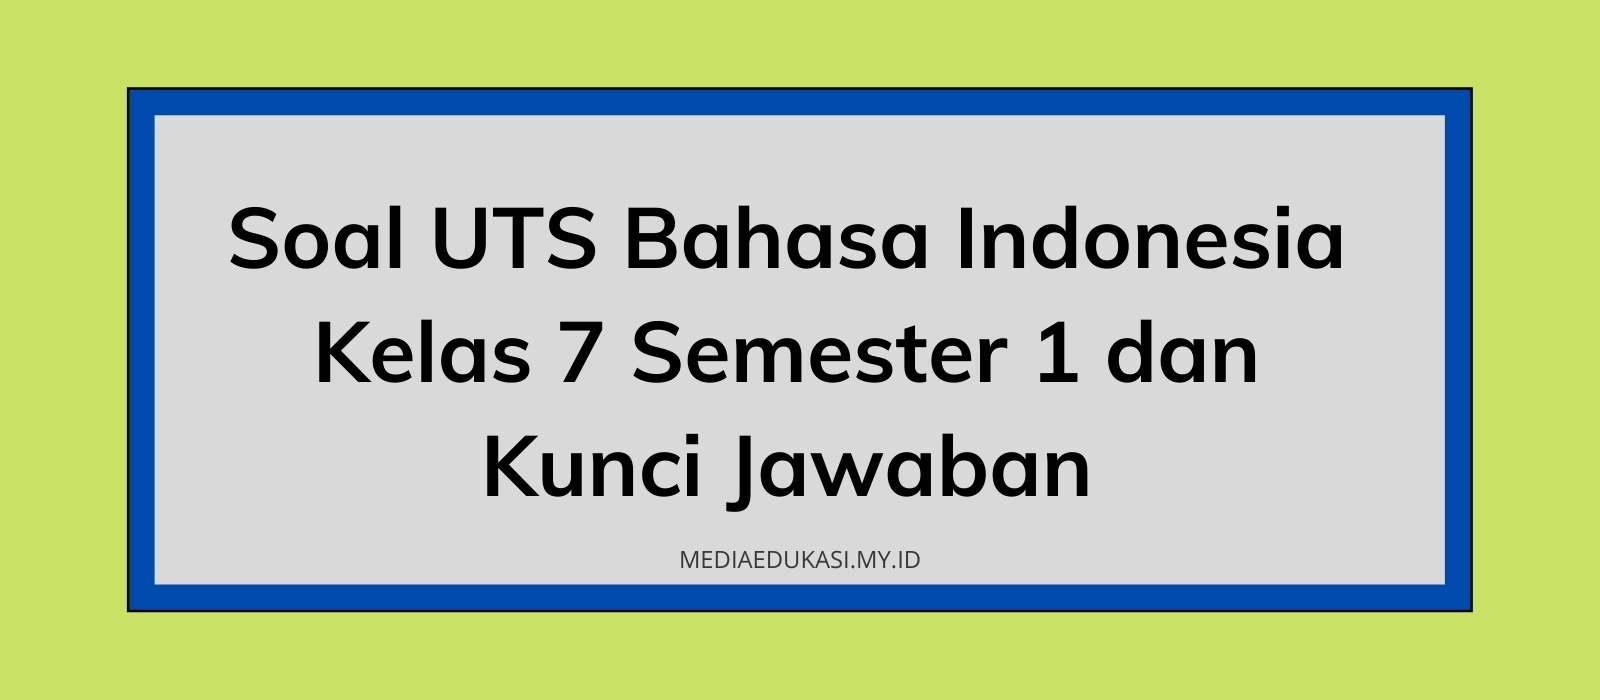 Soal PTS Bahasa Indonesia Kelas 7 Semester 1 dan Kunci Jawaban